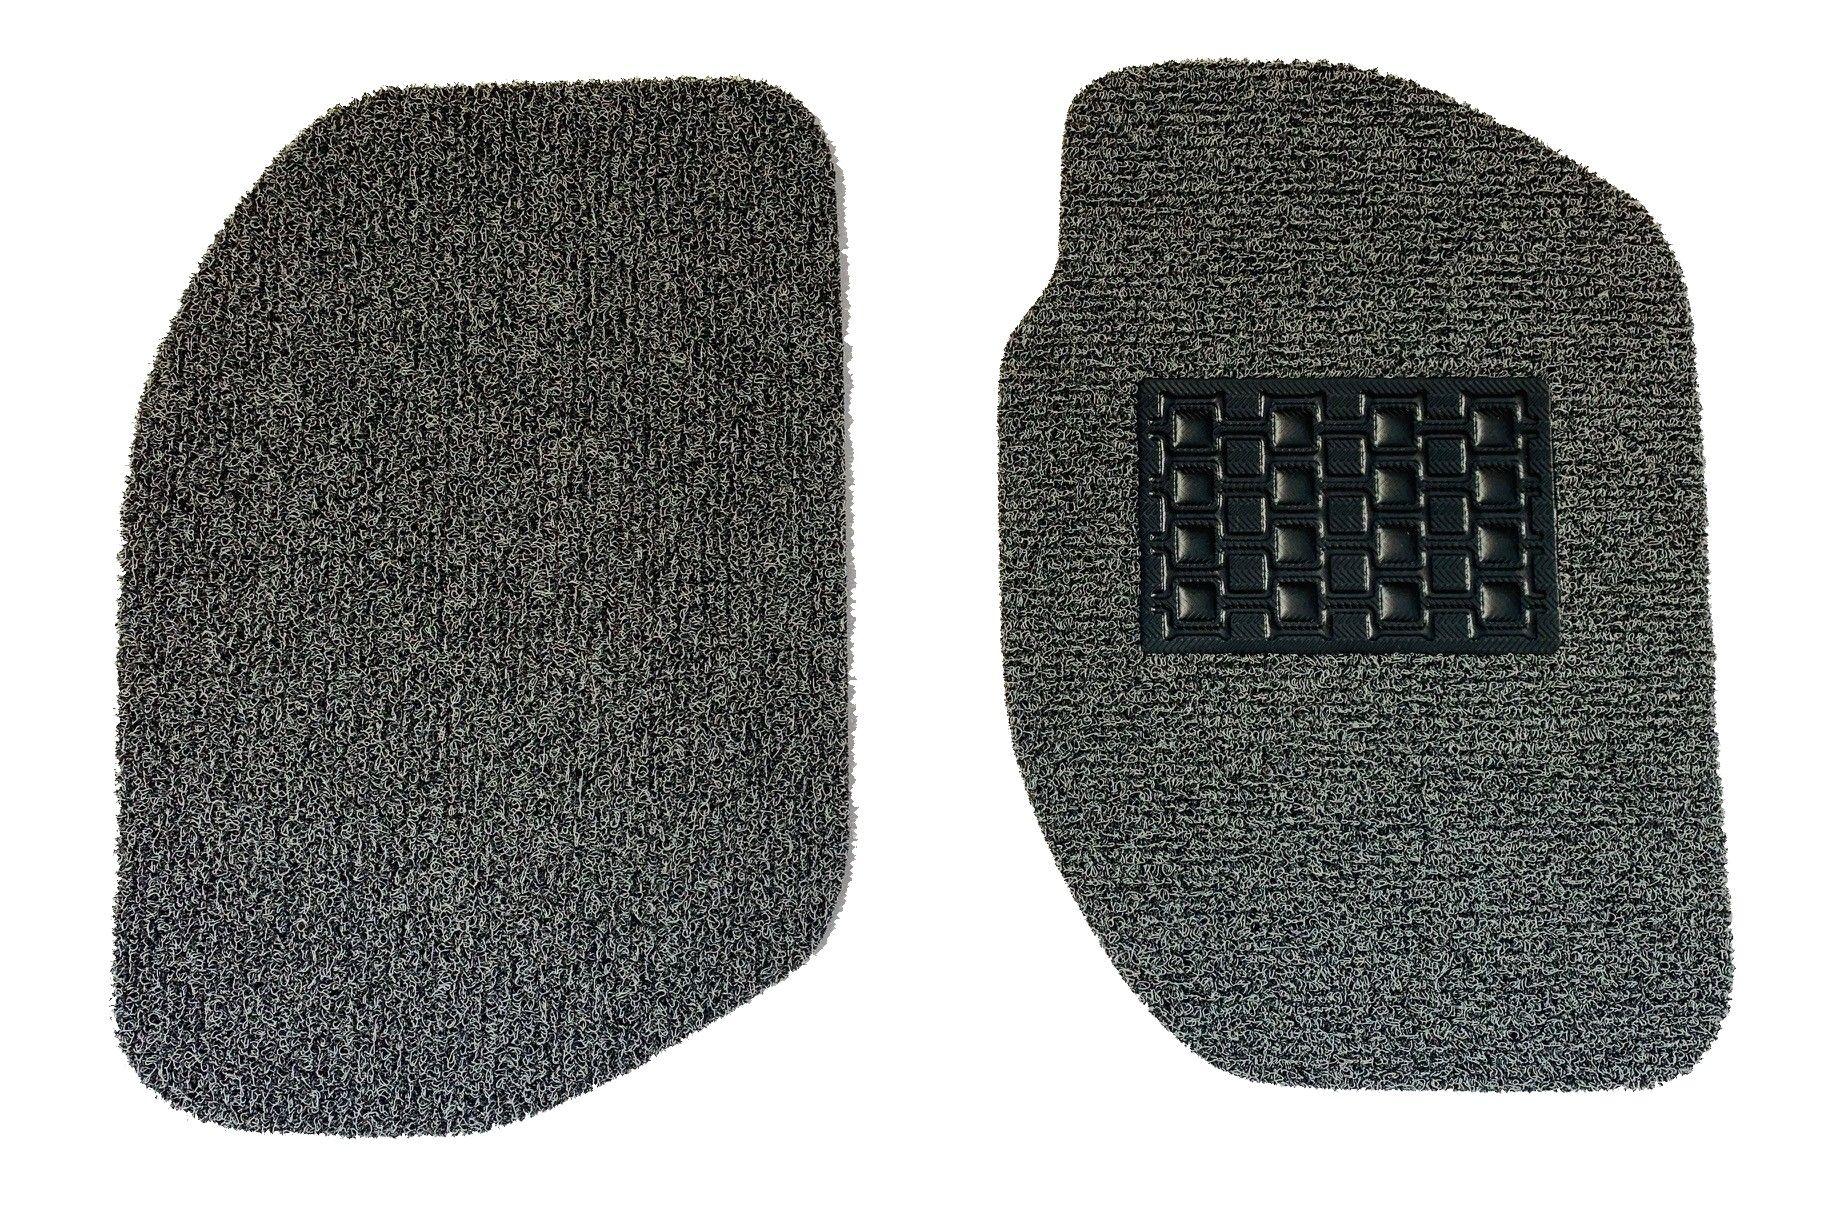 Paddock 'Weave' Mats - Freelander 1 - Front Pair - RHD